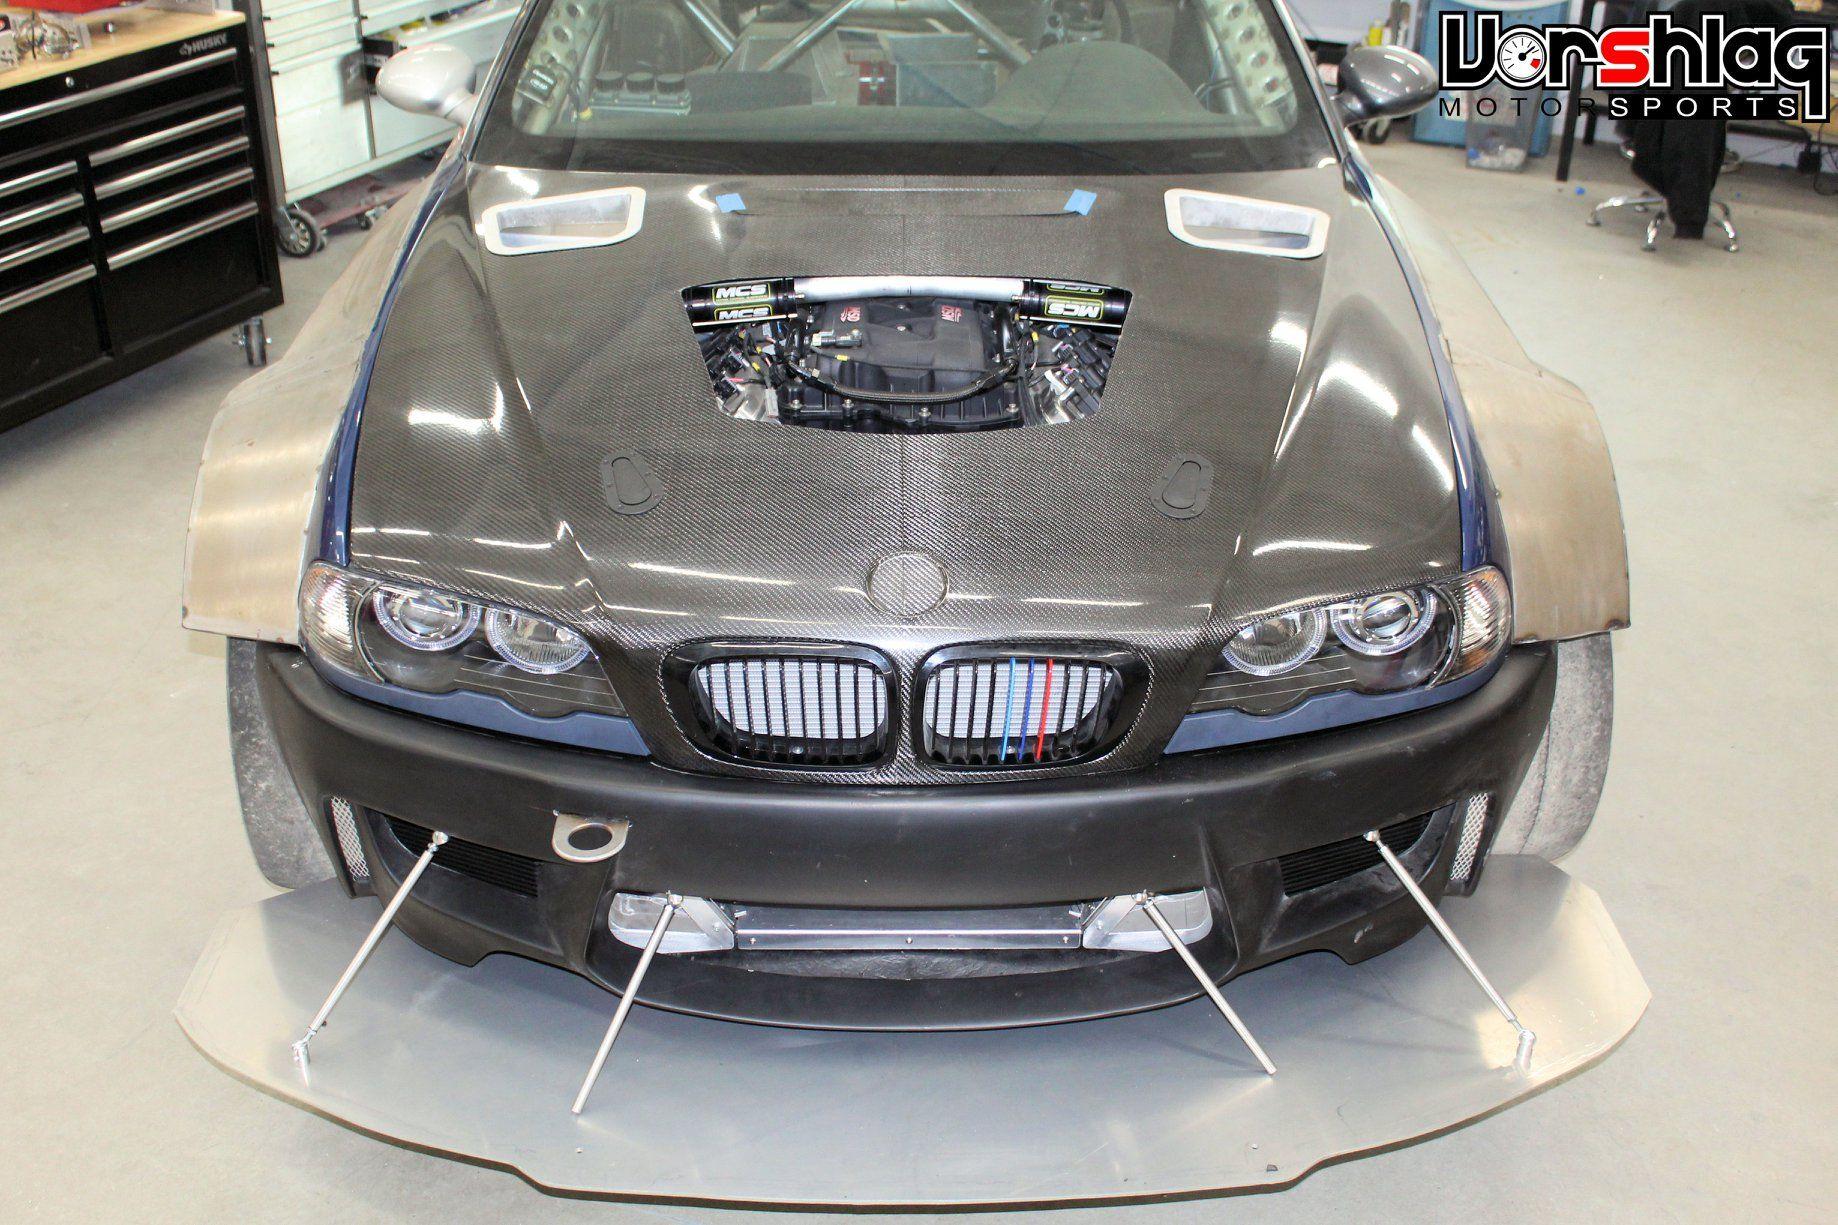 BMW E46 M3 with a 468 ci LS7 V8 – Engine Swap Depot | BMW